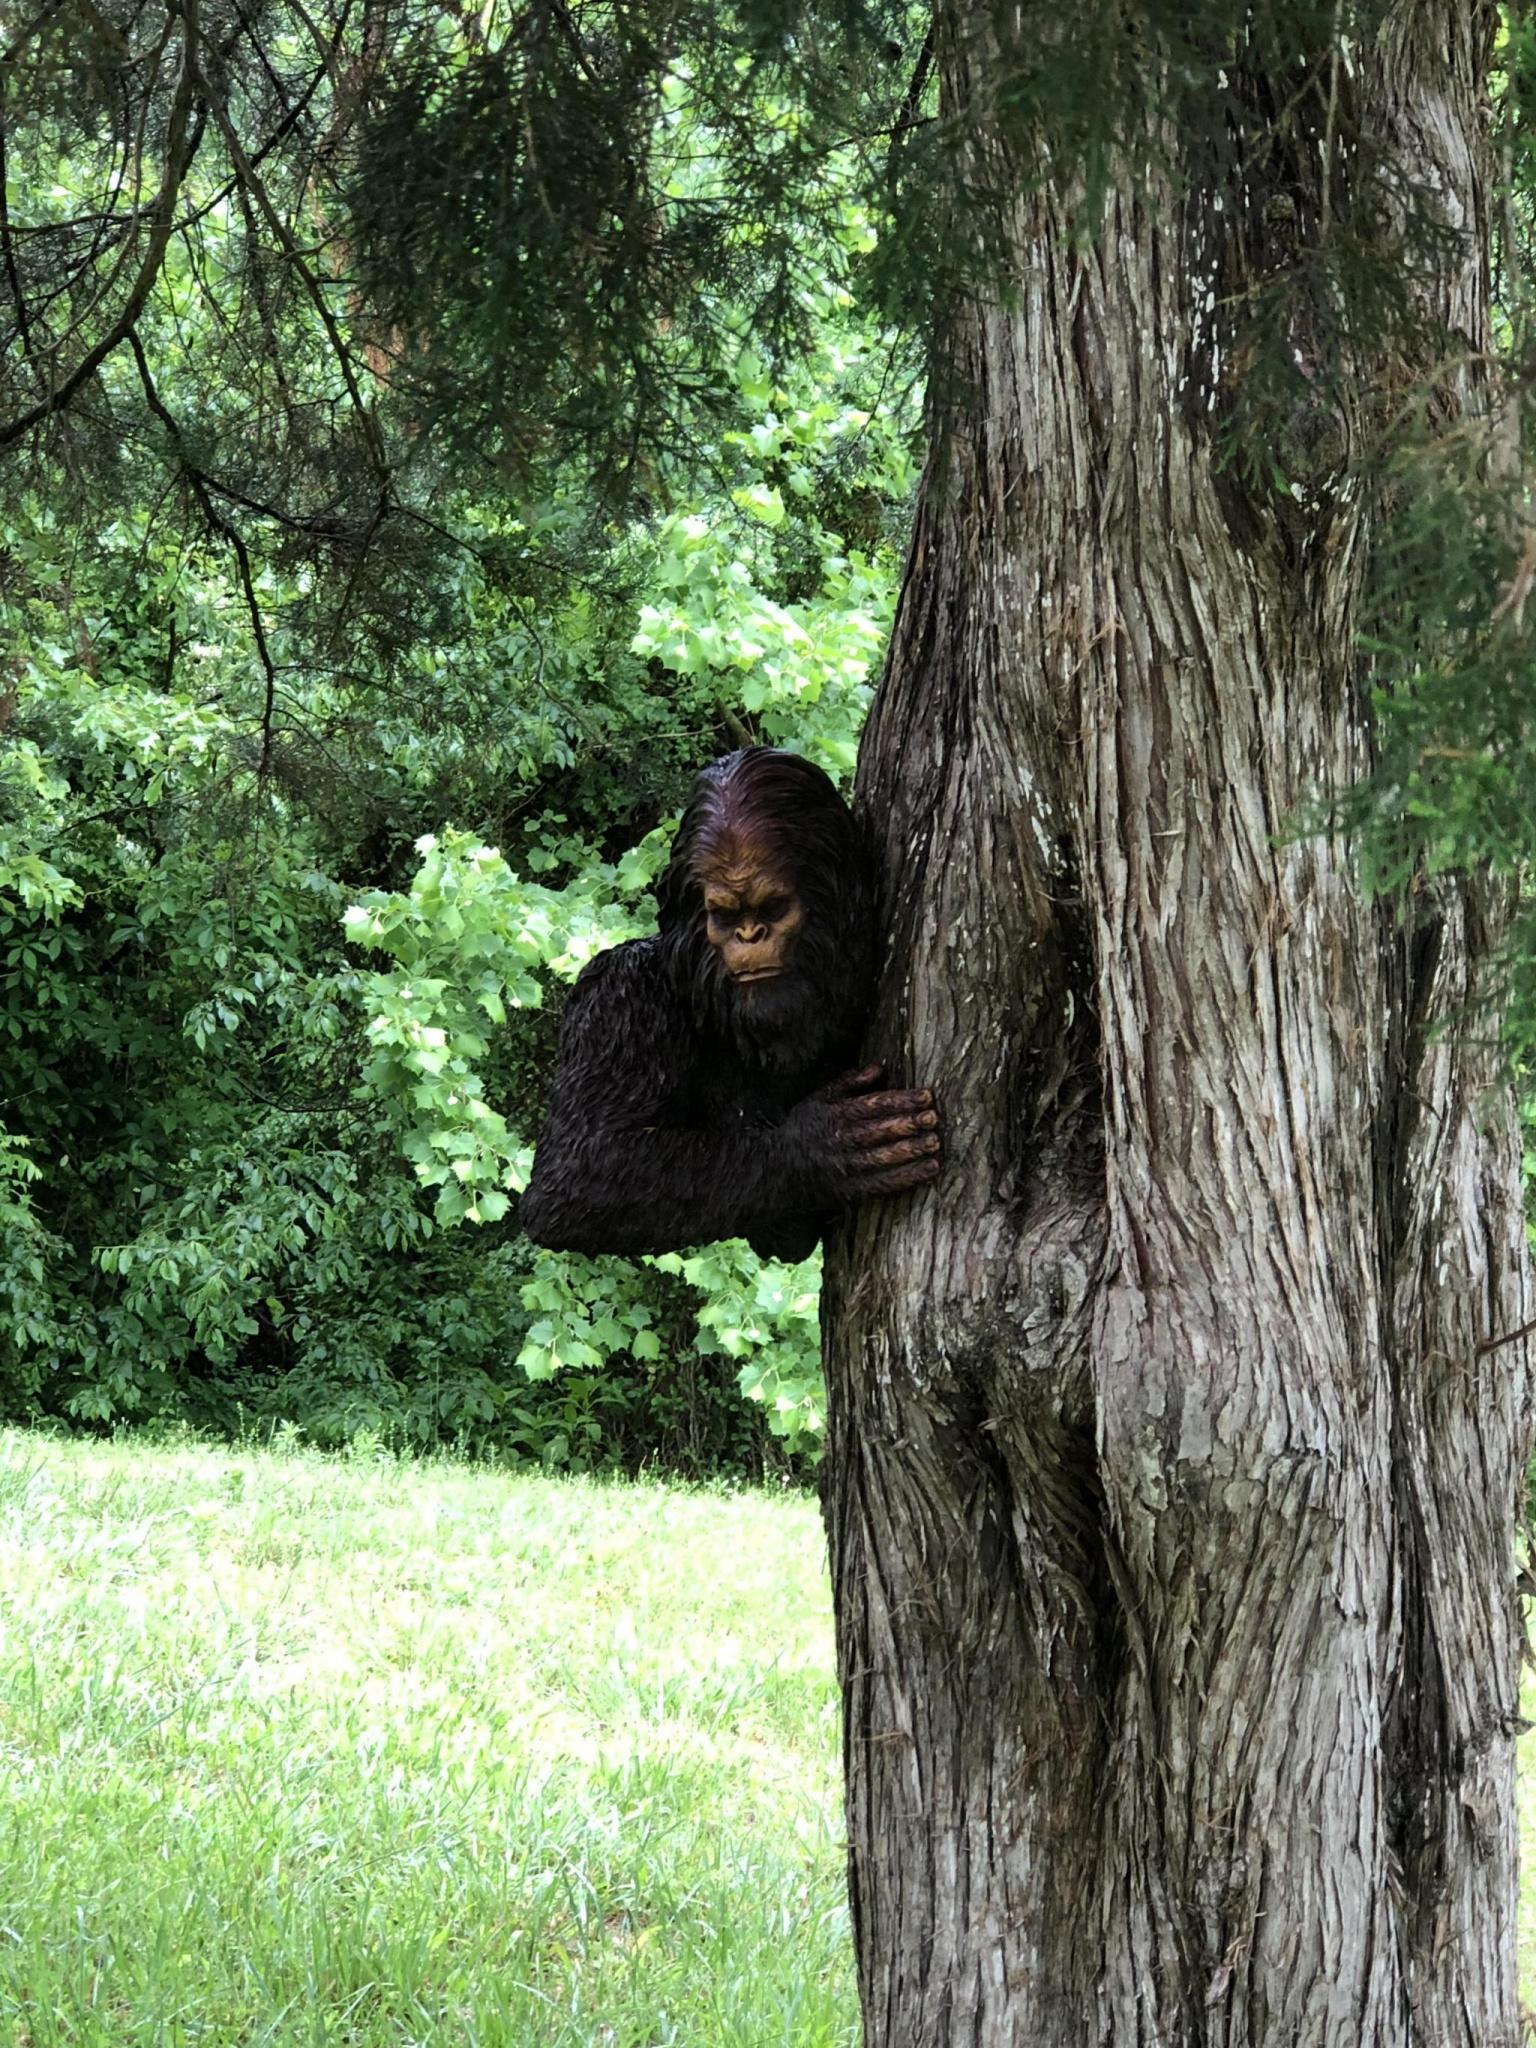 Anybody find Bigfoot yet?-9e6fe88d-fb64-4bcc-a322-248d6806de7d_1557679547029.jpg